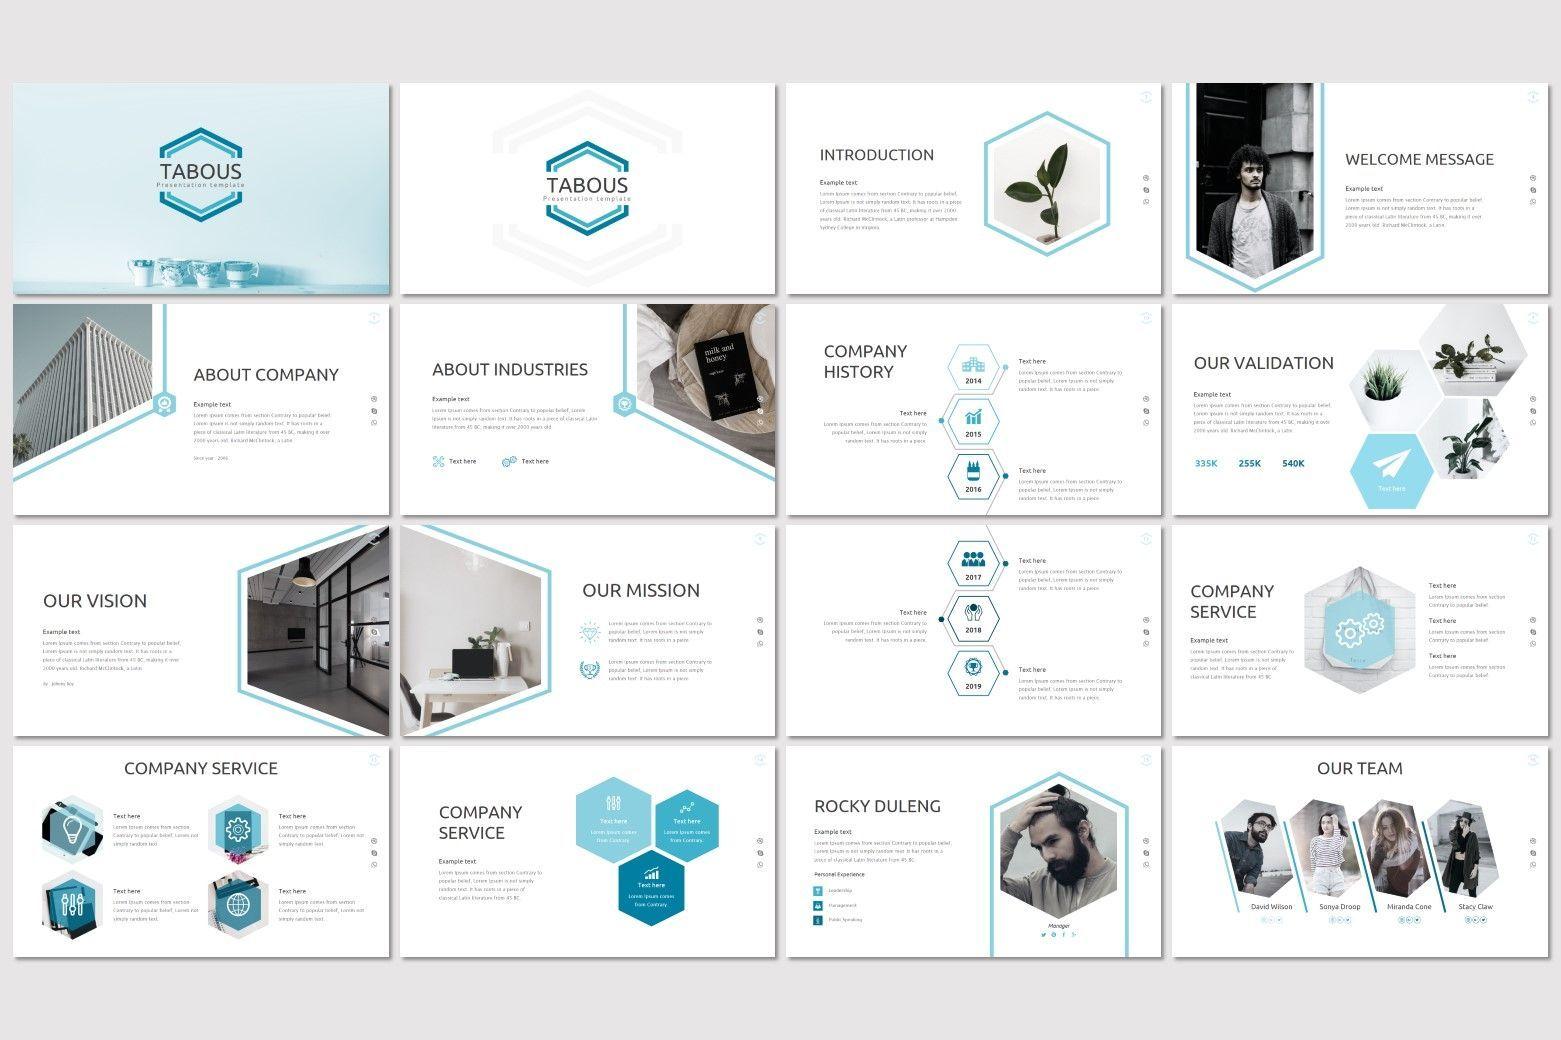 Tabous - PowerPoint Template, Slide 2, 07170, Presentation Templates — PoweredTemplate.com